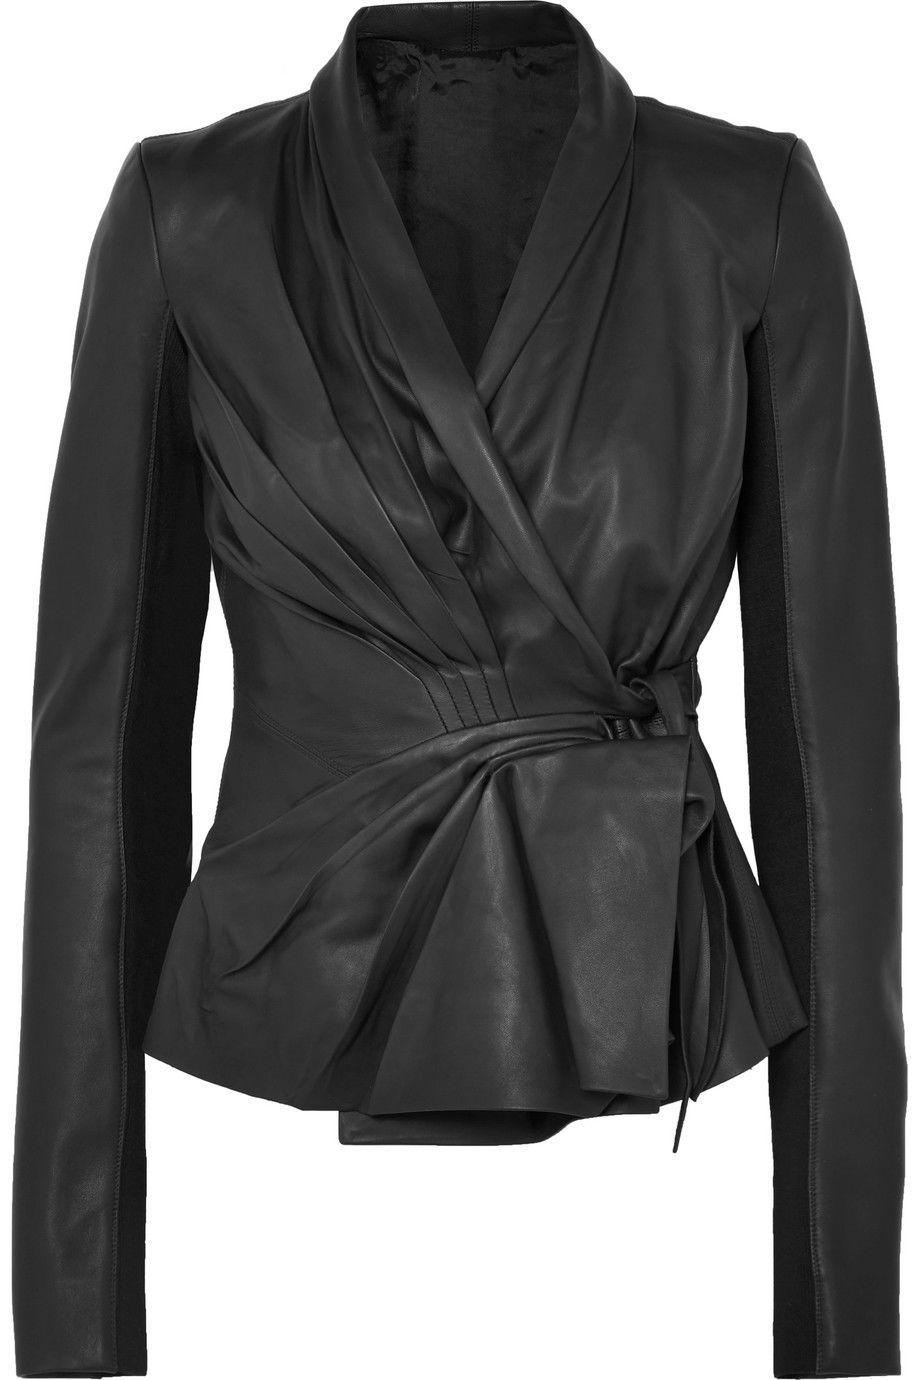 #PopbelaOOTD: Jaket Kulit untuk Sehari-hari